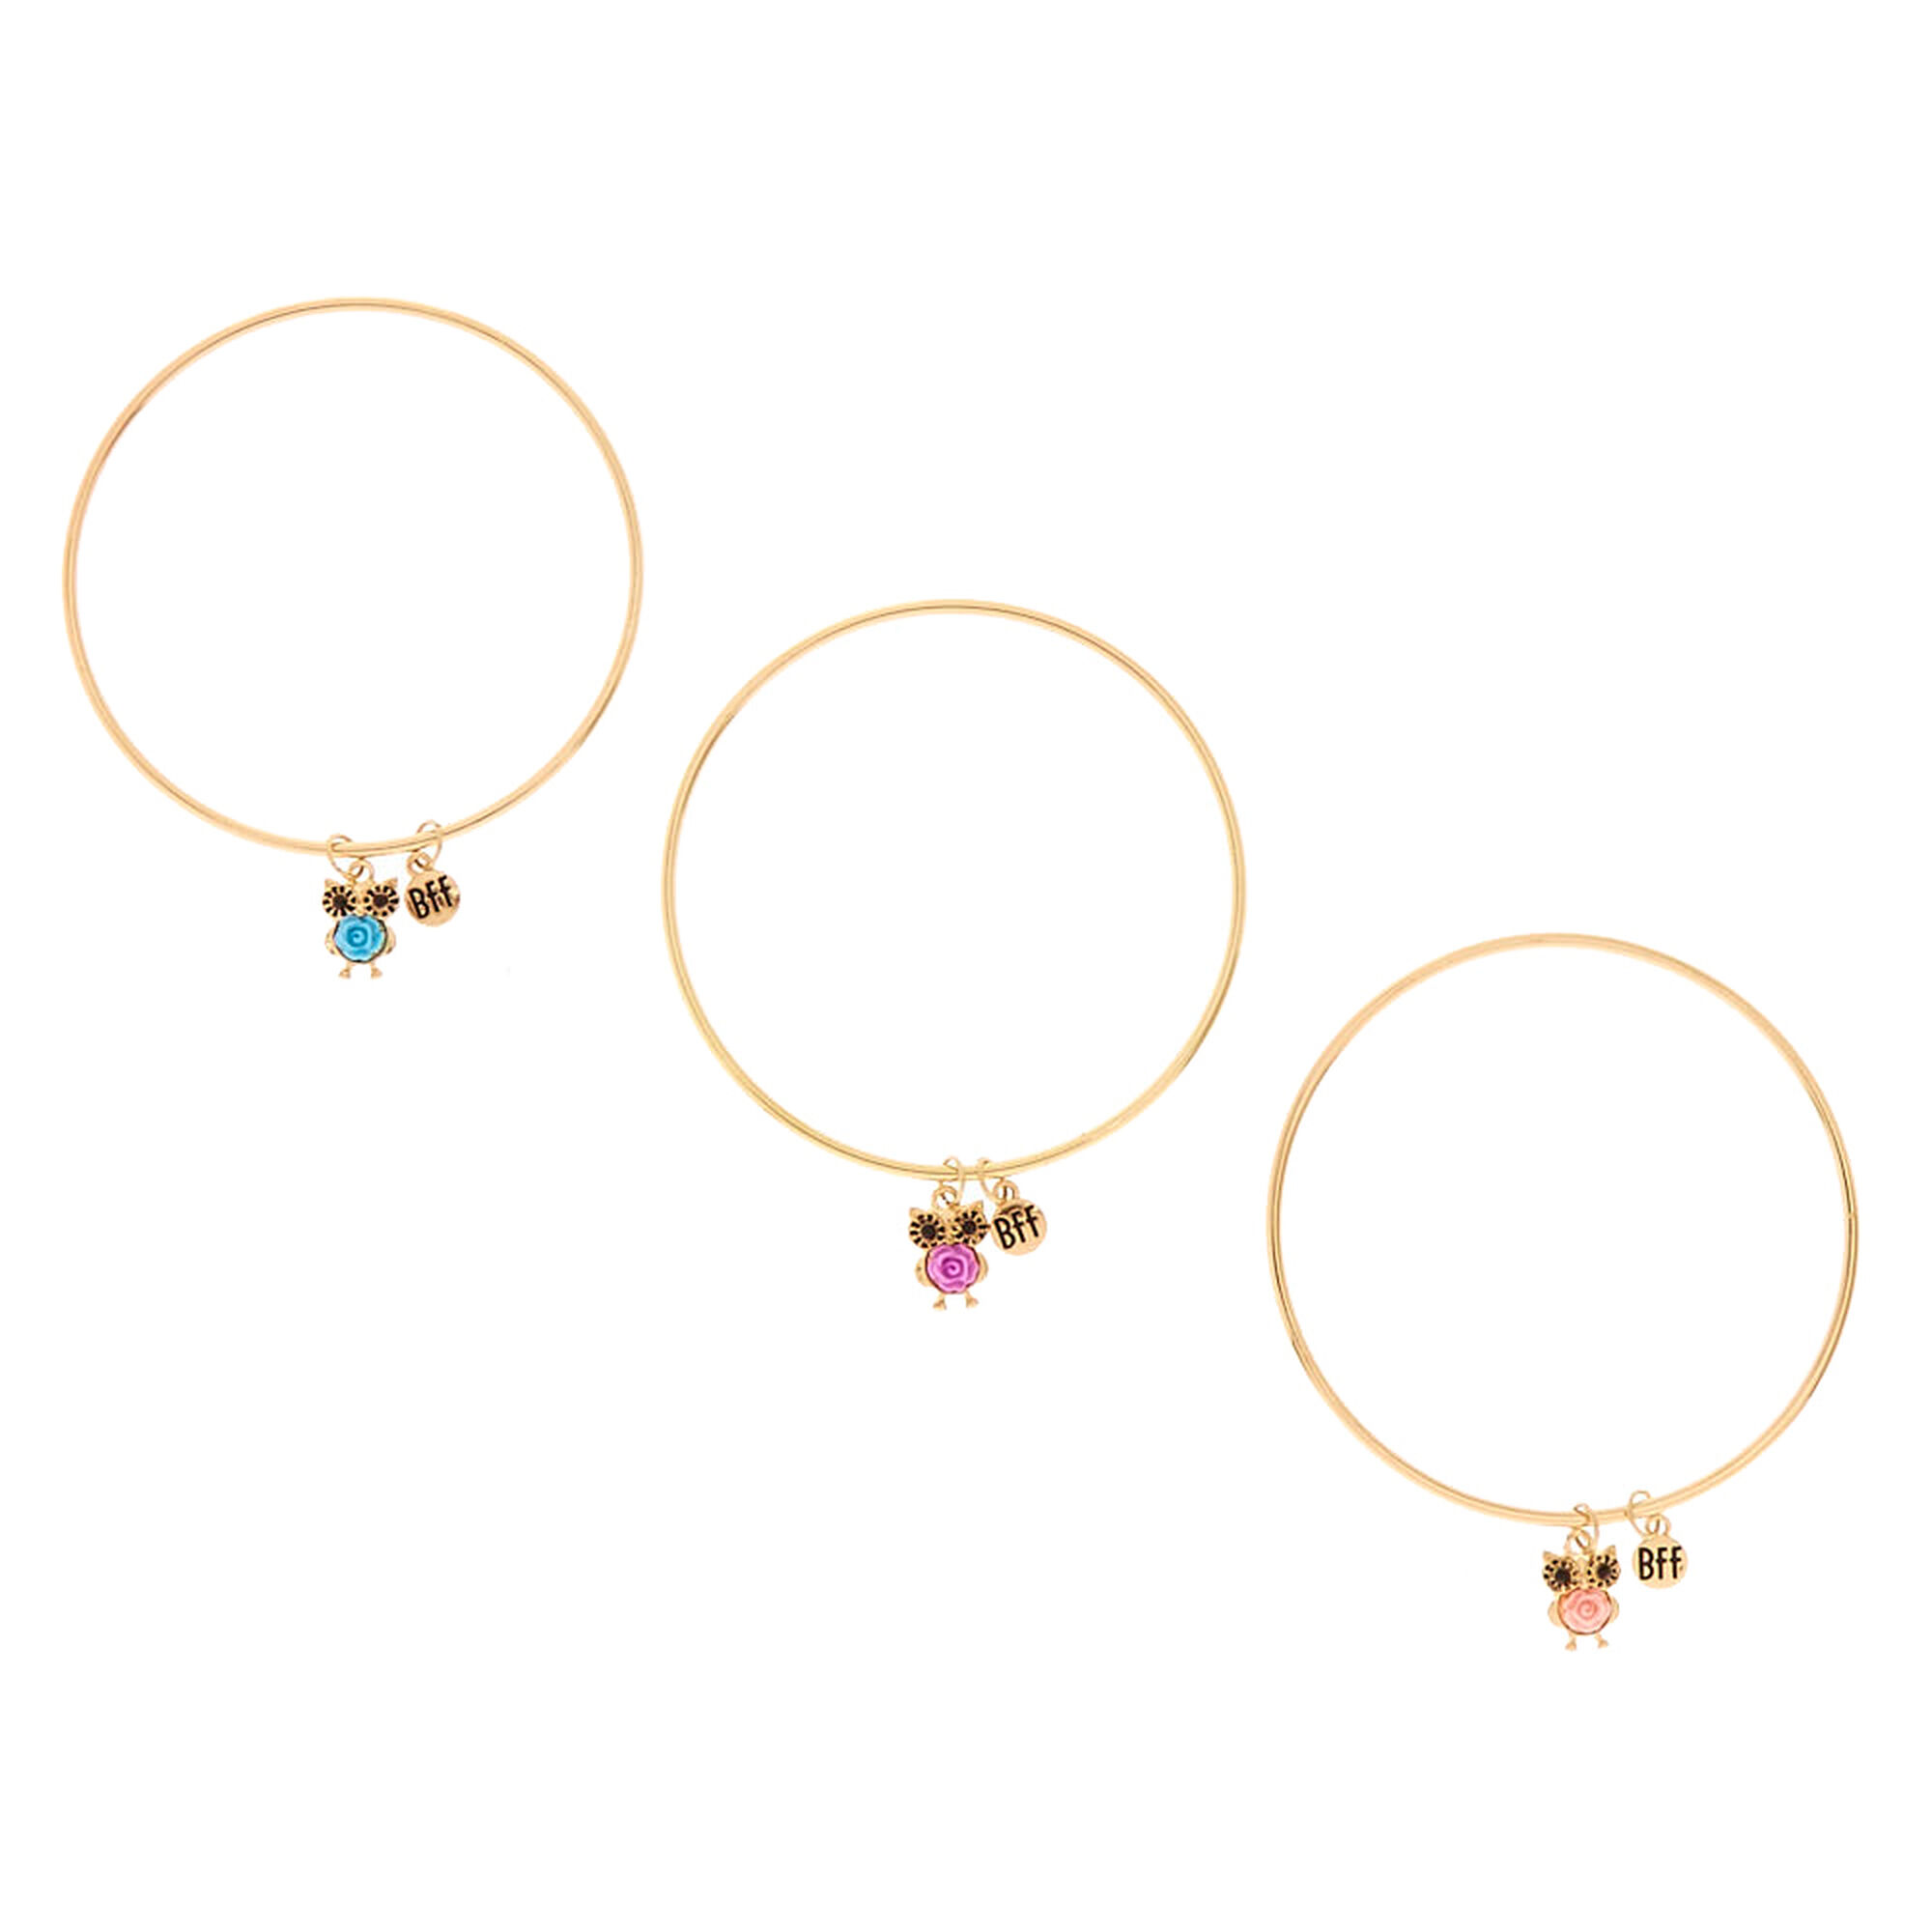 Best Friends Gold Tone Owl Charm Bangle Bracelets